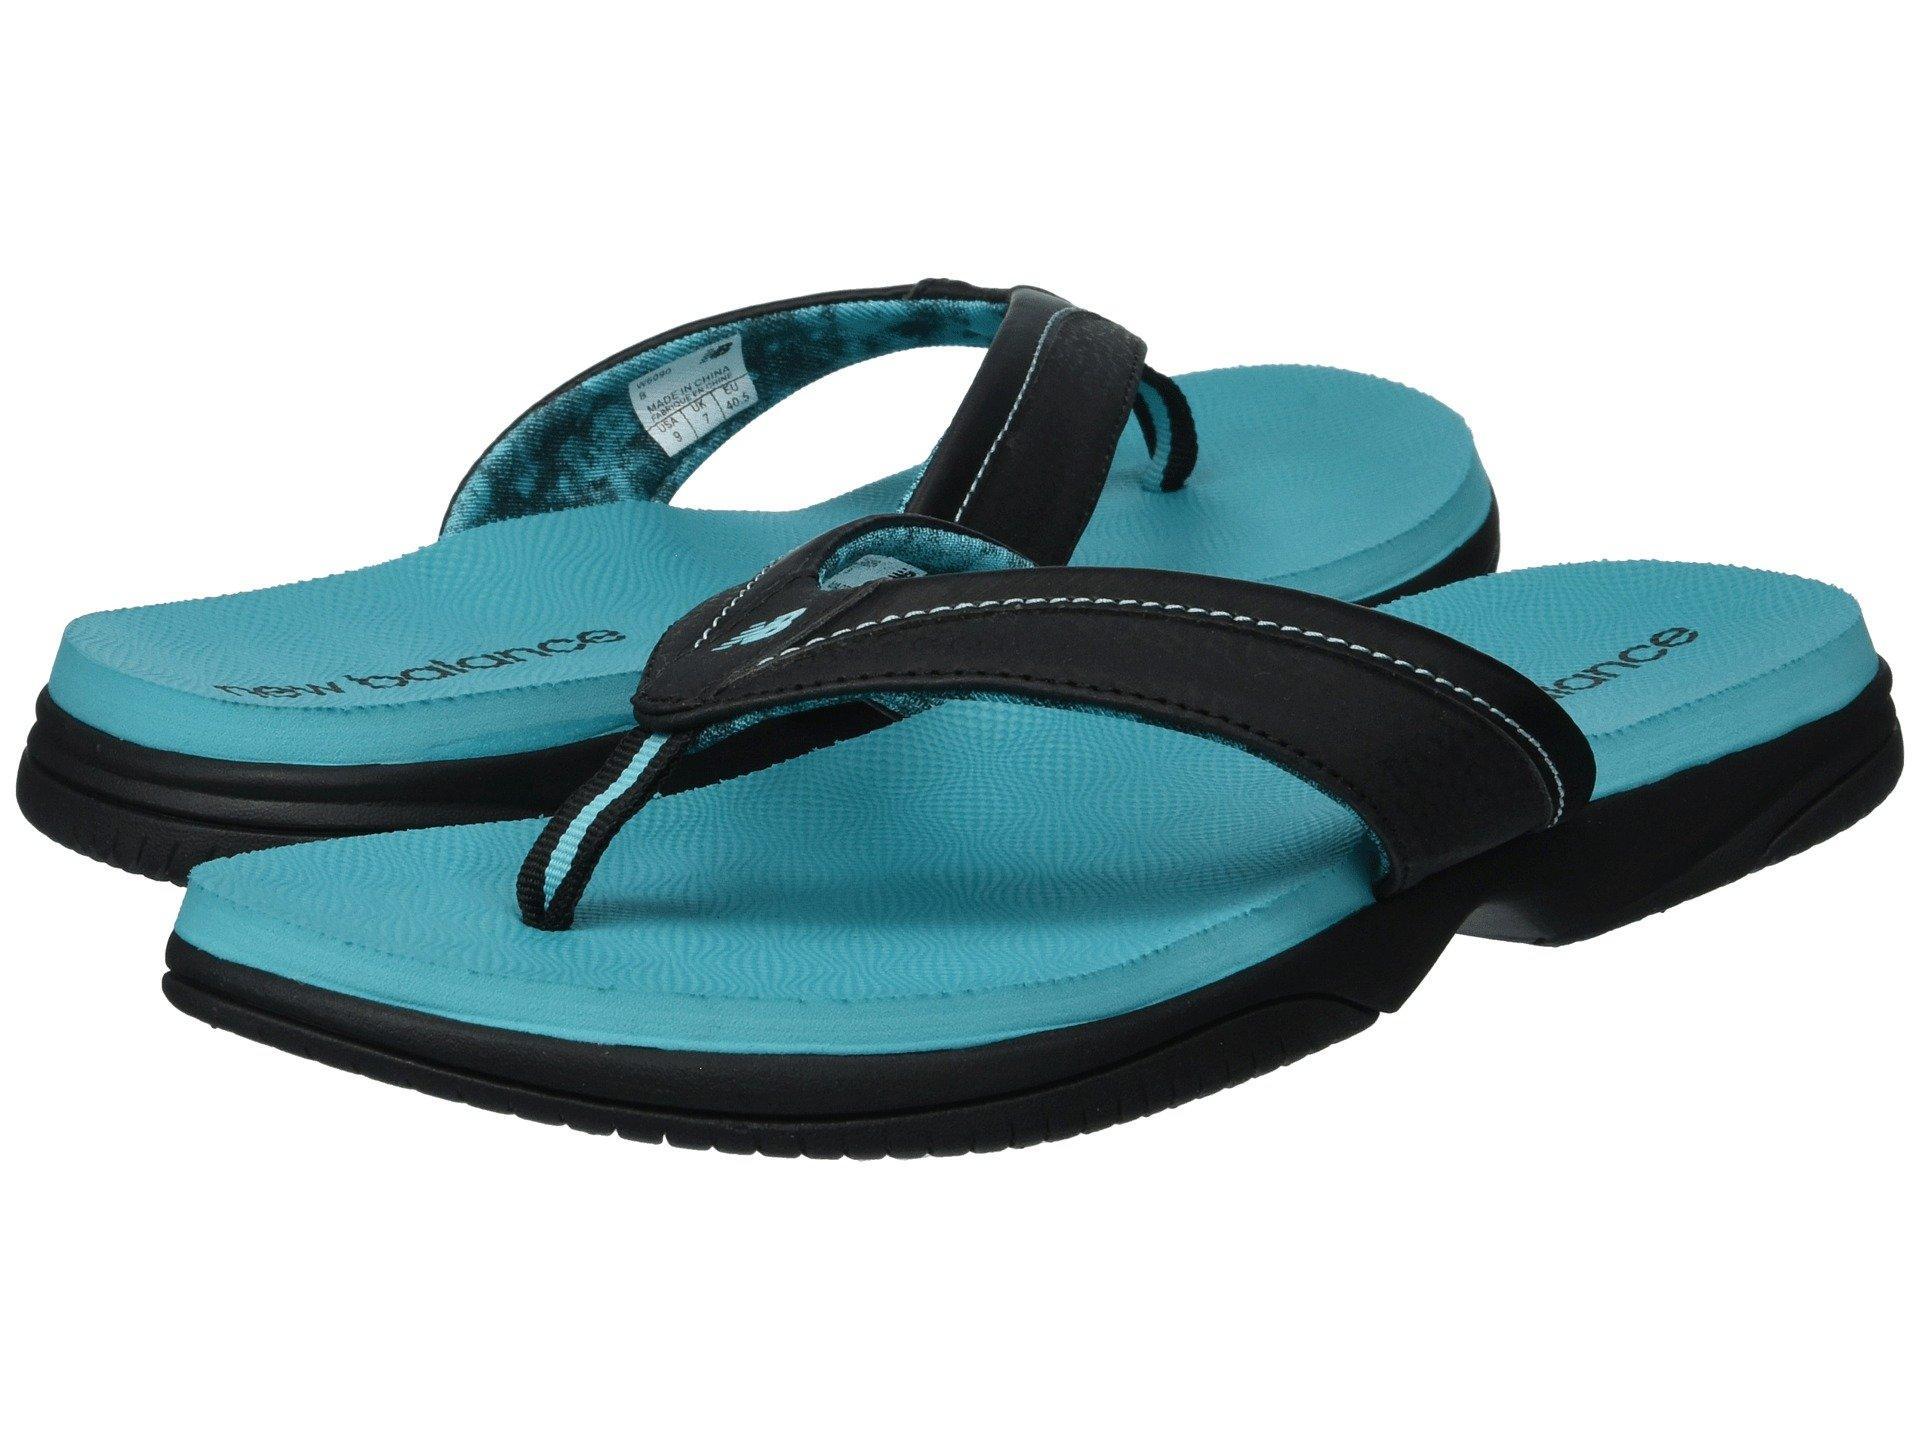 439278bff5e1 Lyst - New Balance Jojo Thong (white silver) Women s Sandals in Black